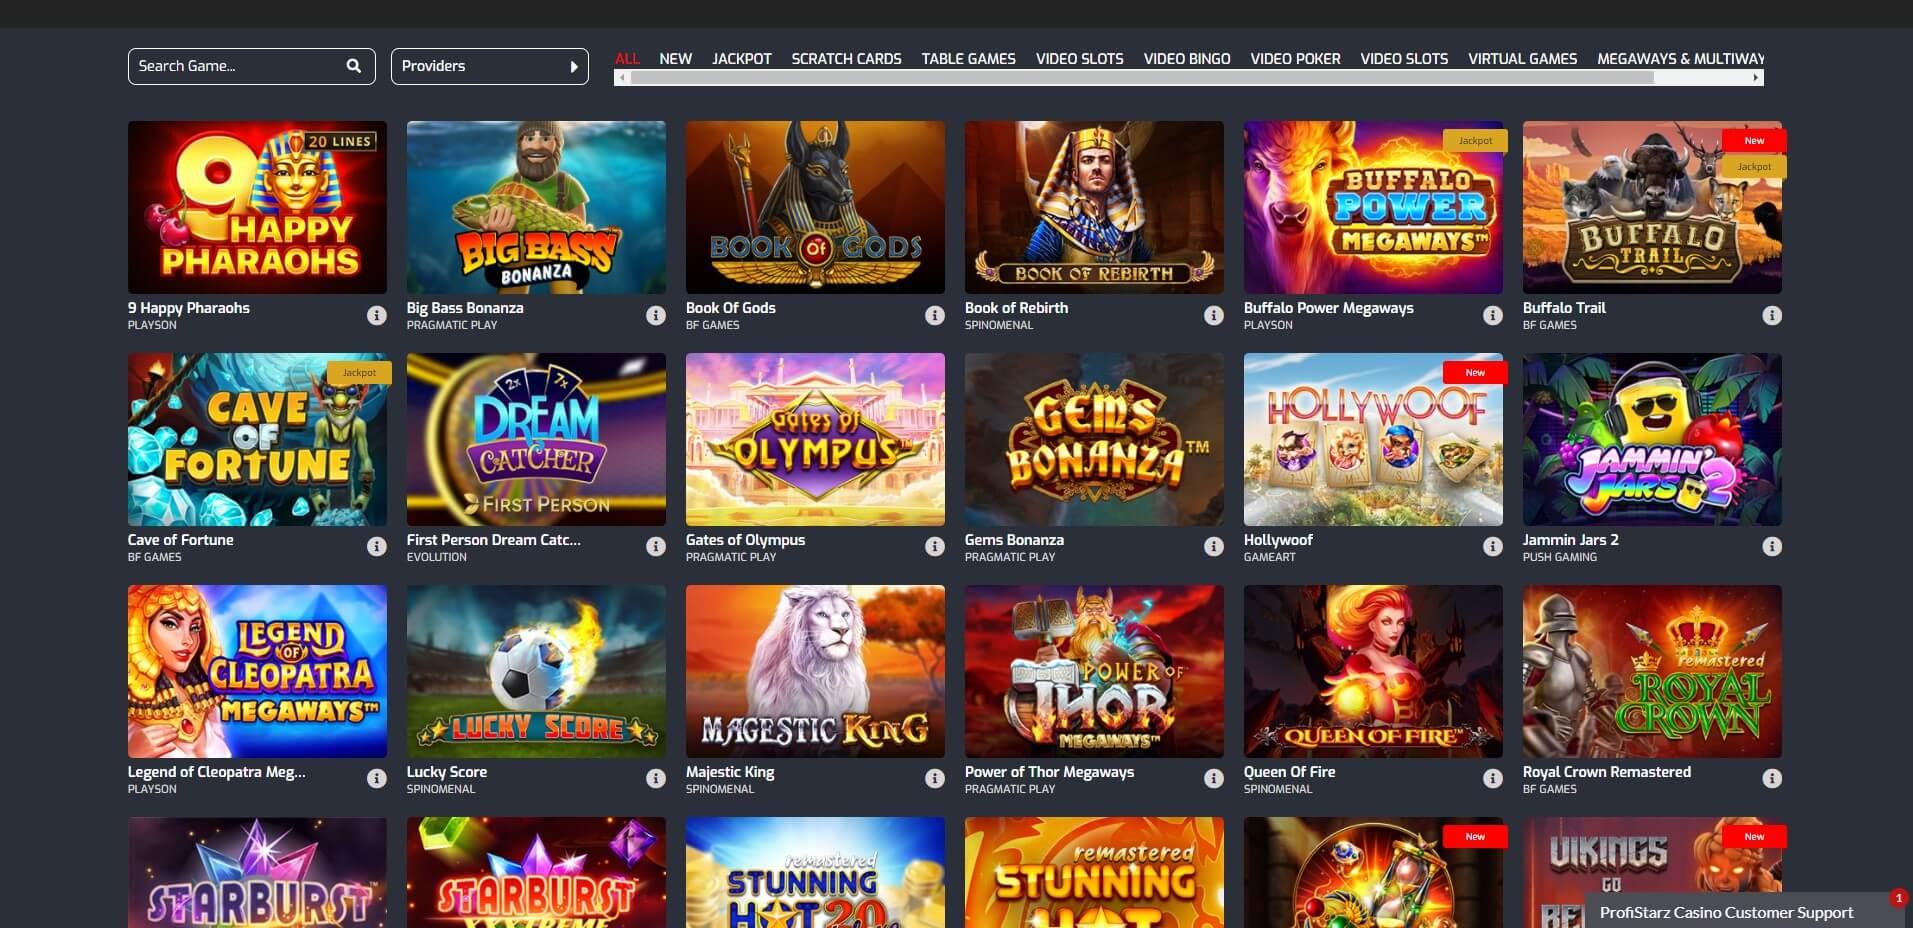 Games at Profistarz Casino